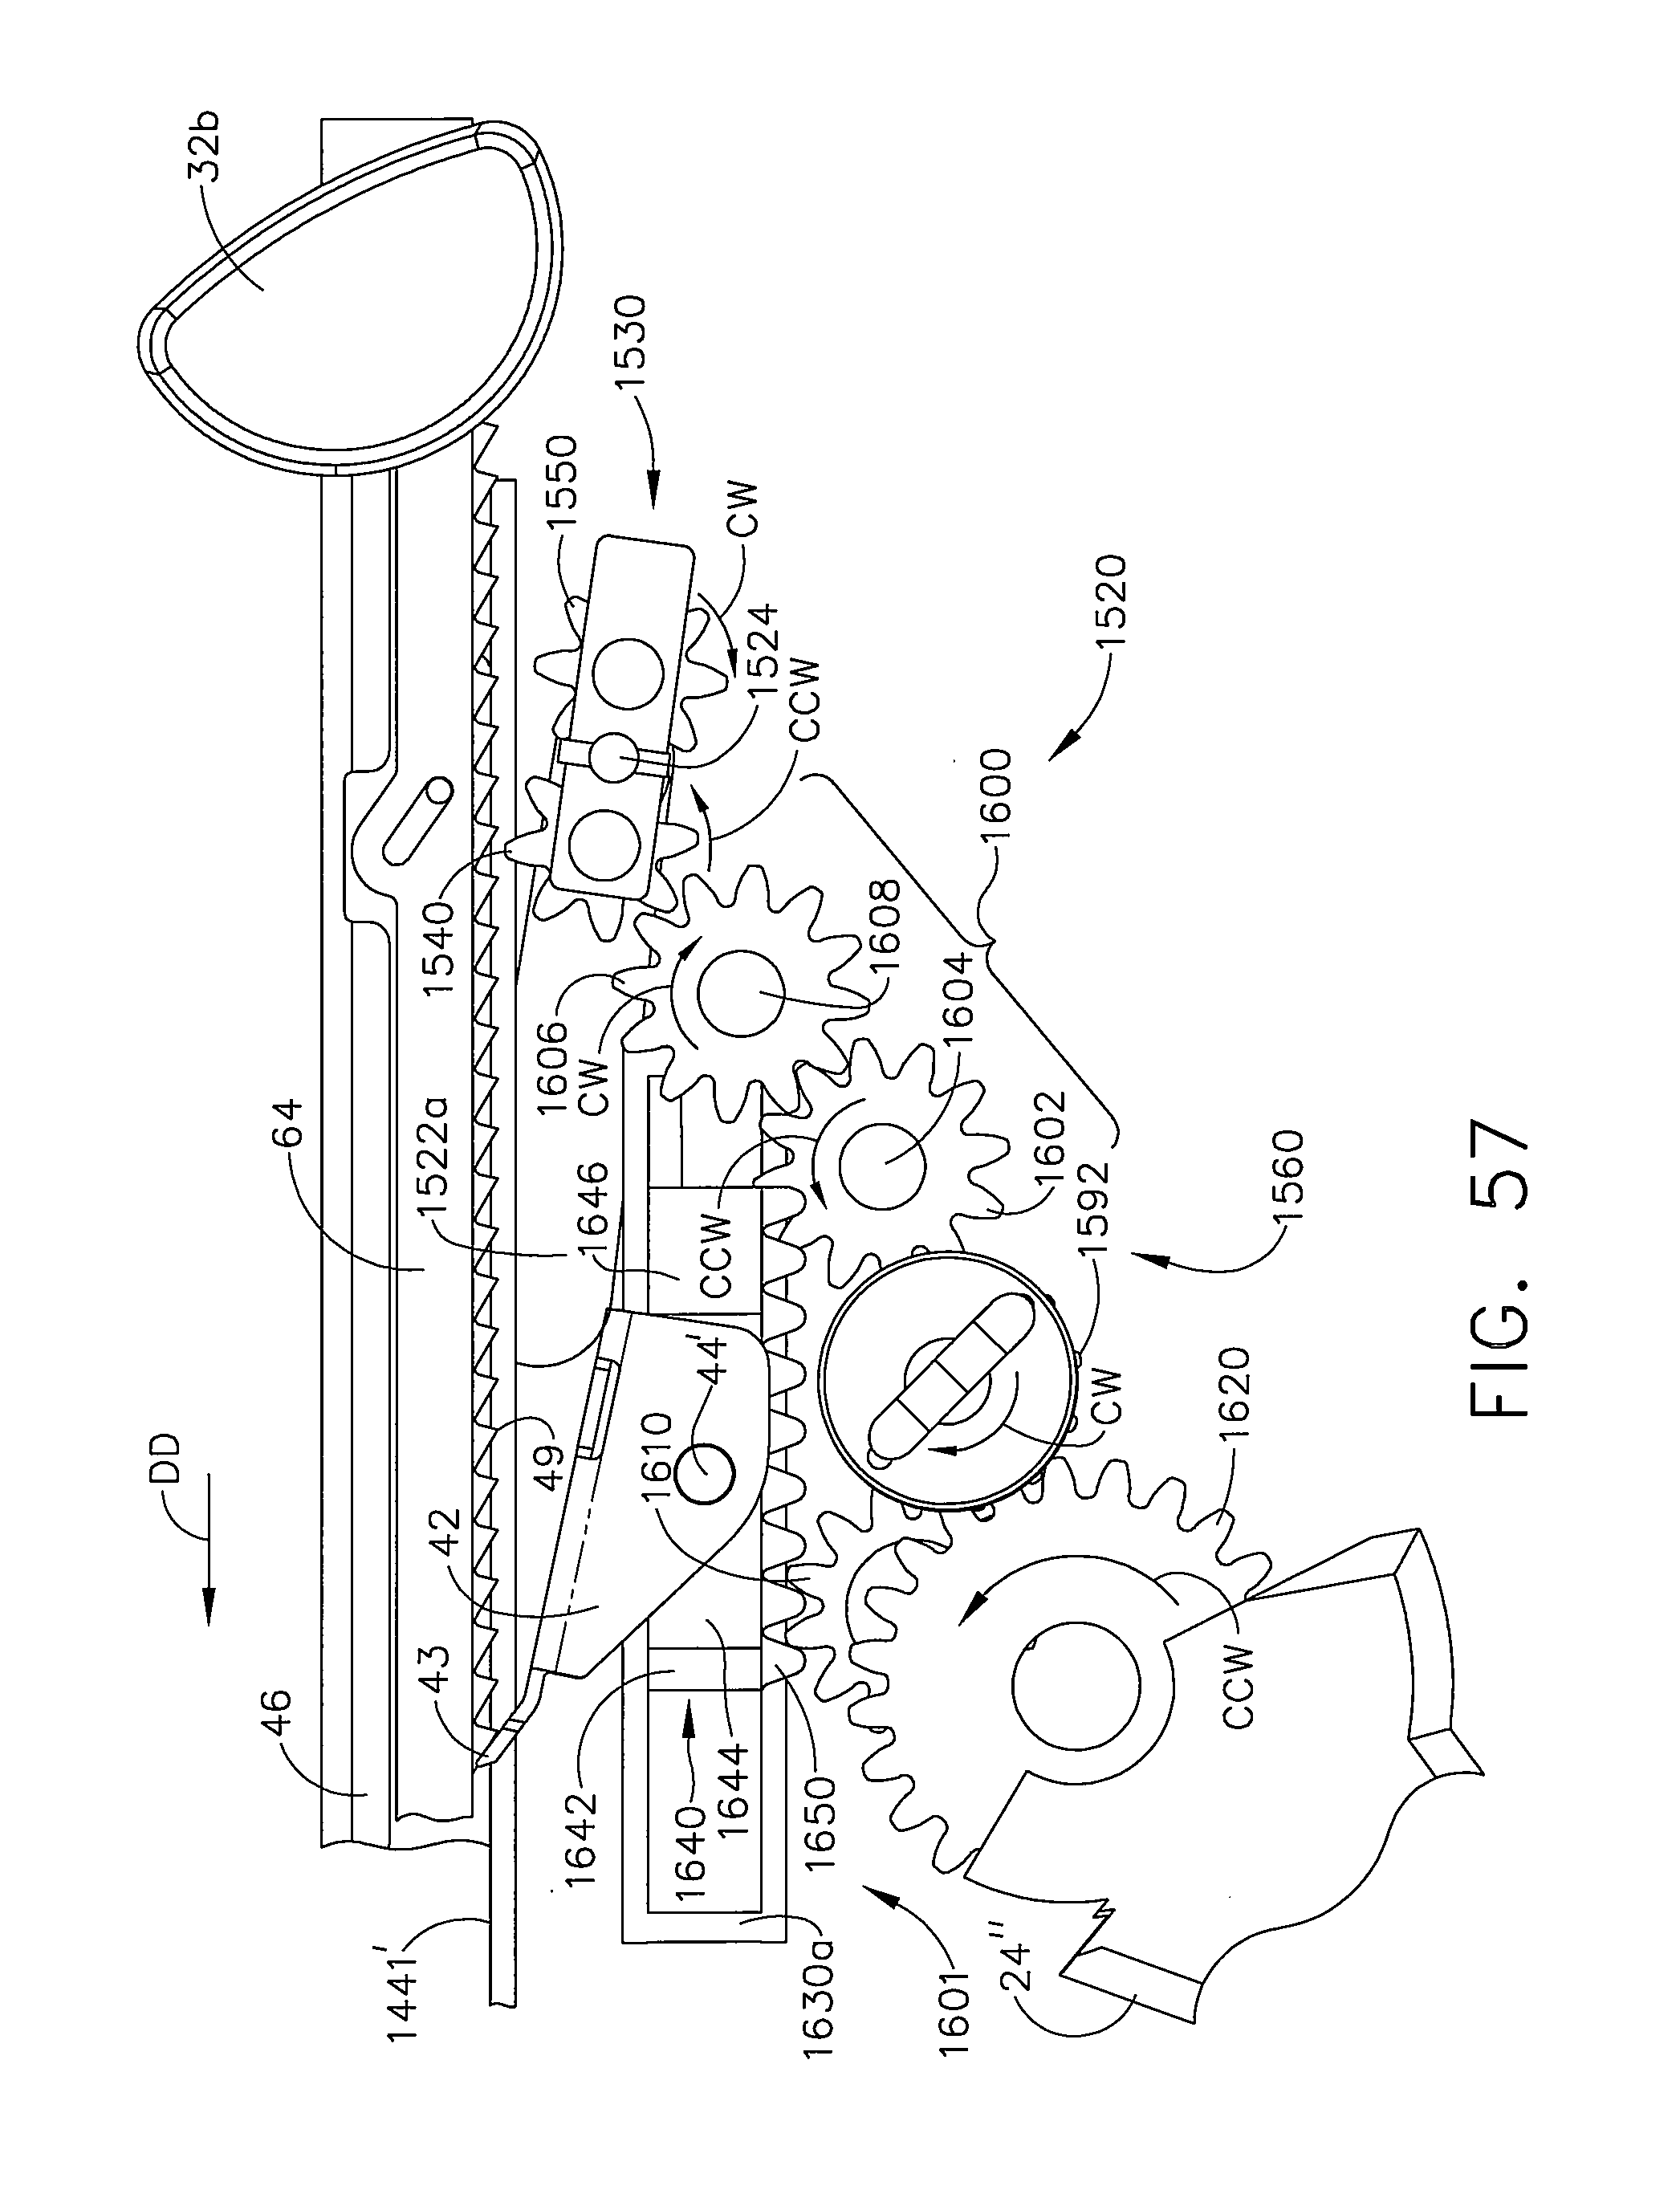 Patent US 9,211,121 B2